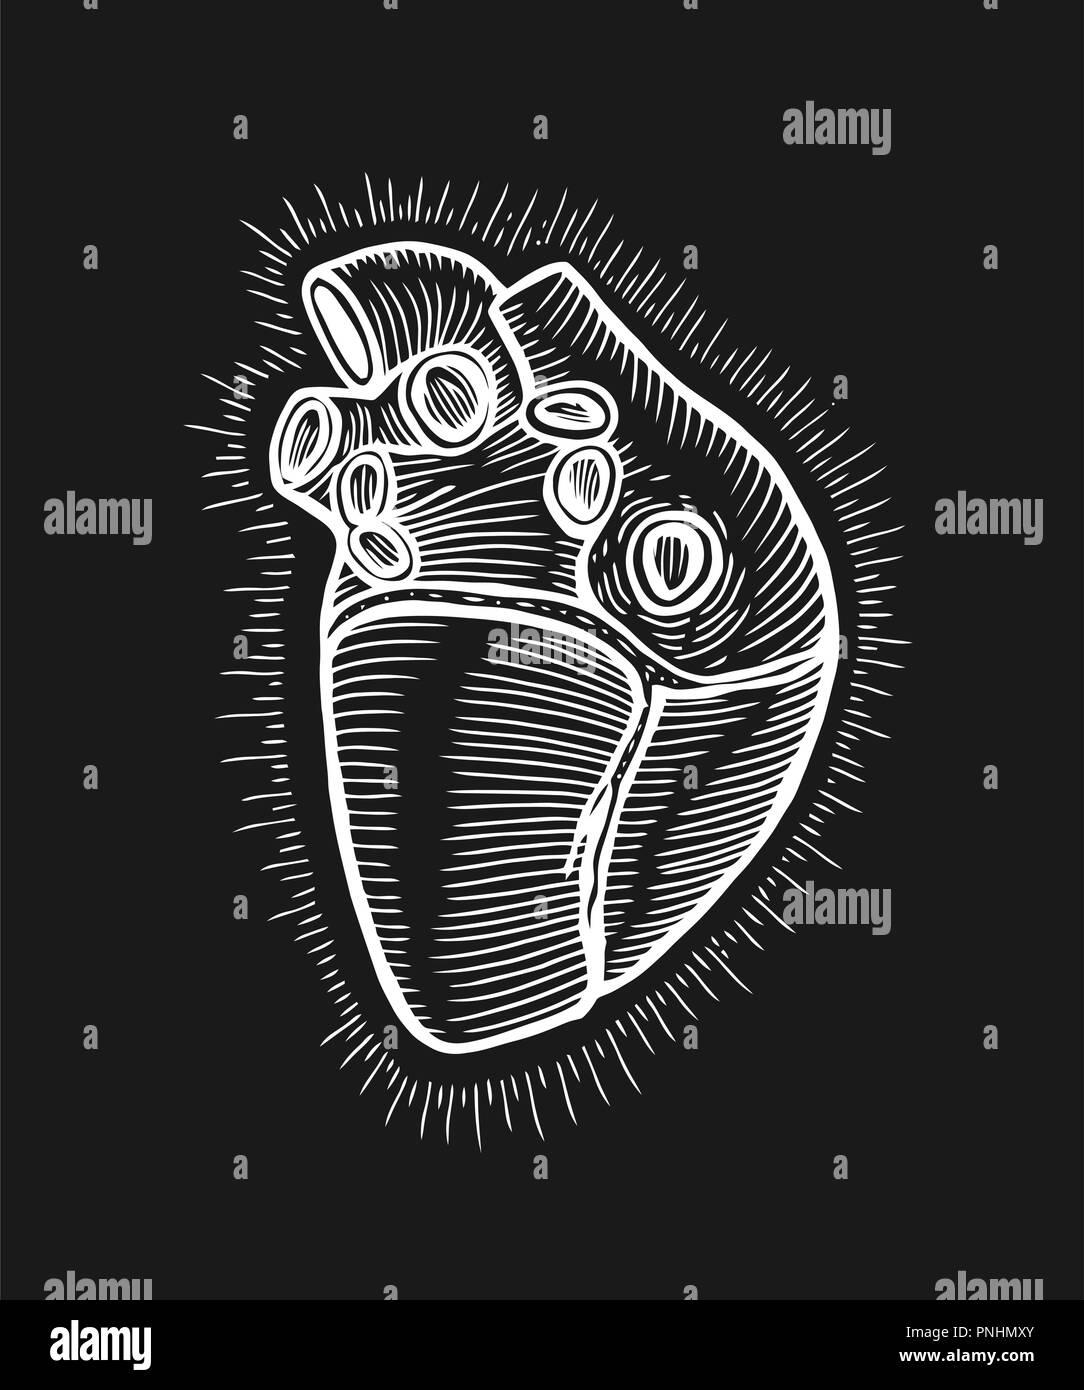 Hand Drawn Human Heart With Sunburst Anatomically Correct Art Flash Tattoo Or Print Design Vector Illustration Stock Vector Image Art Alamy